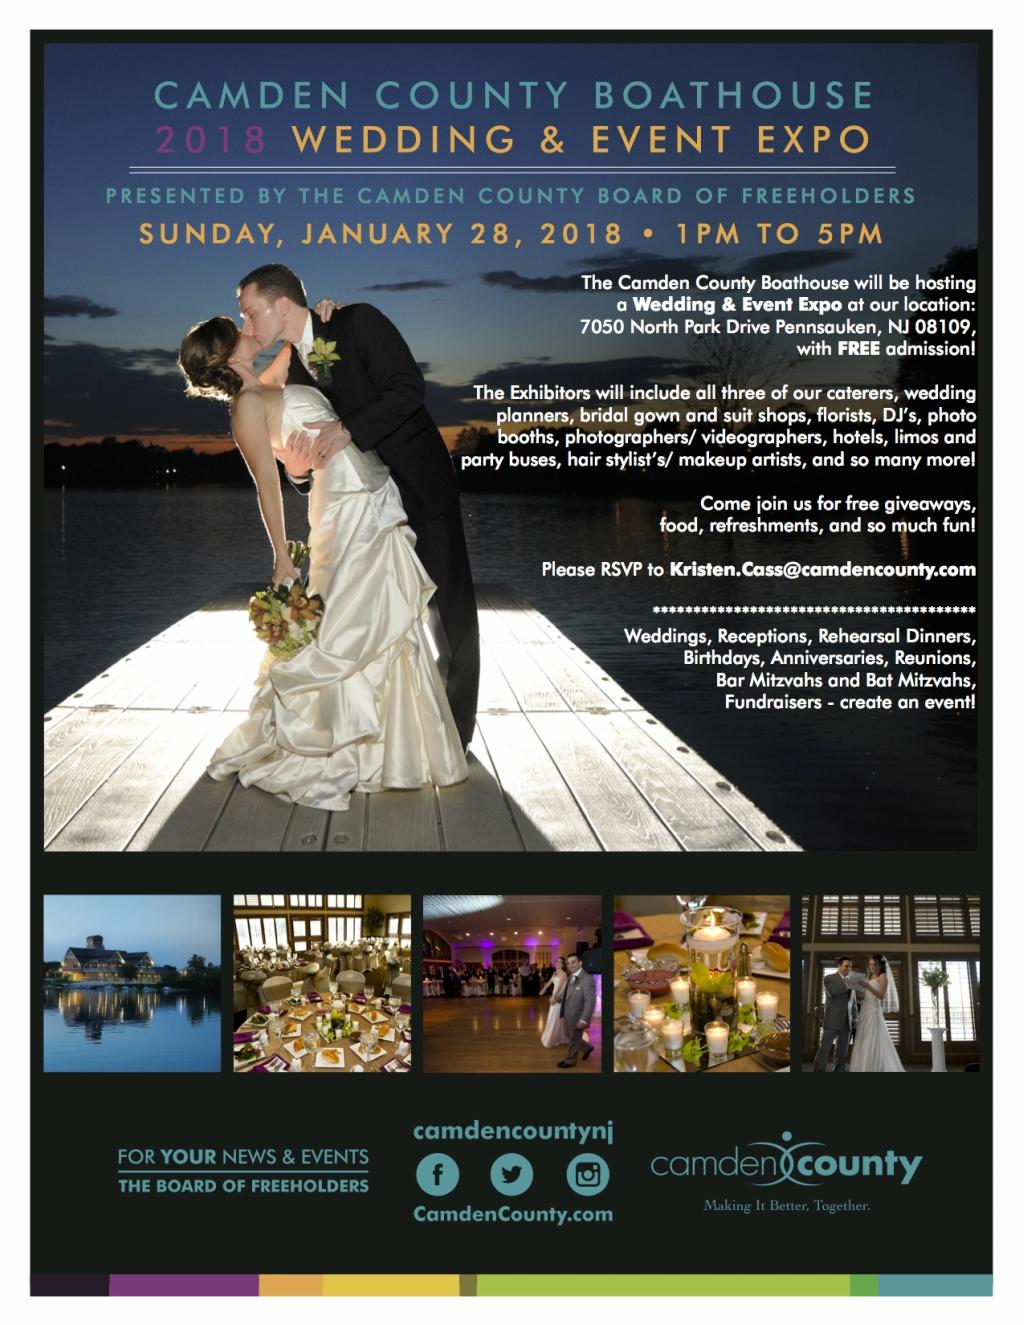 Camden County Boathouse 2018 Wedding and Event Expo Philly In Love Philadelphia Weddings